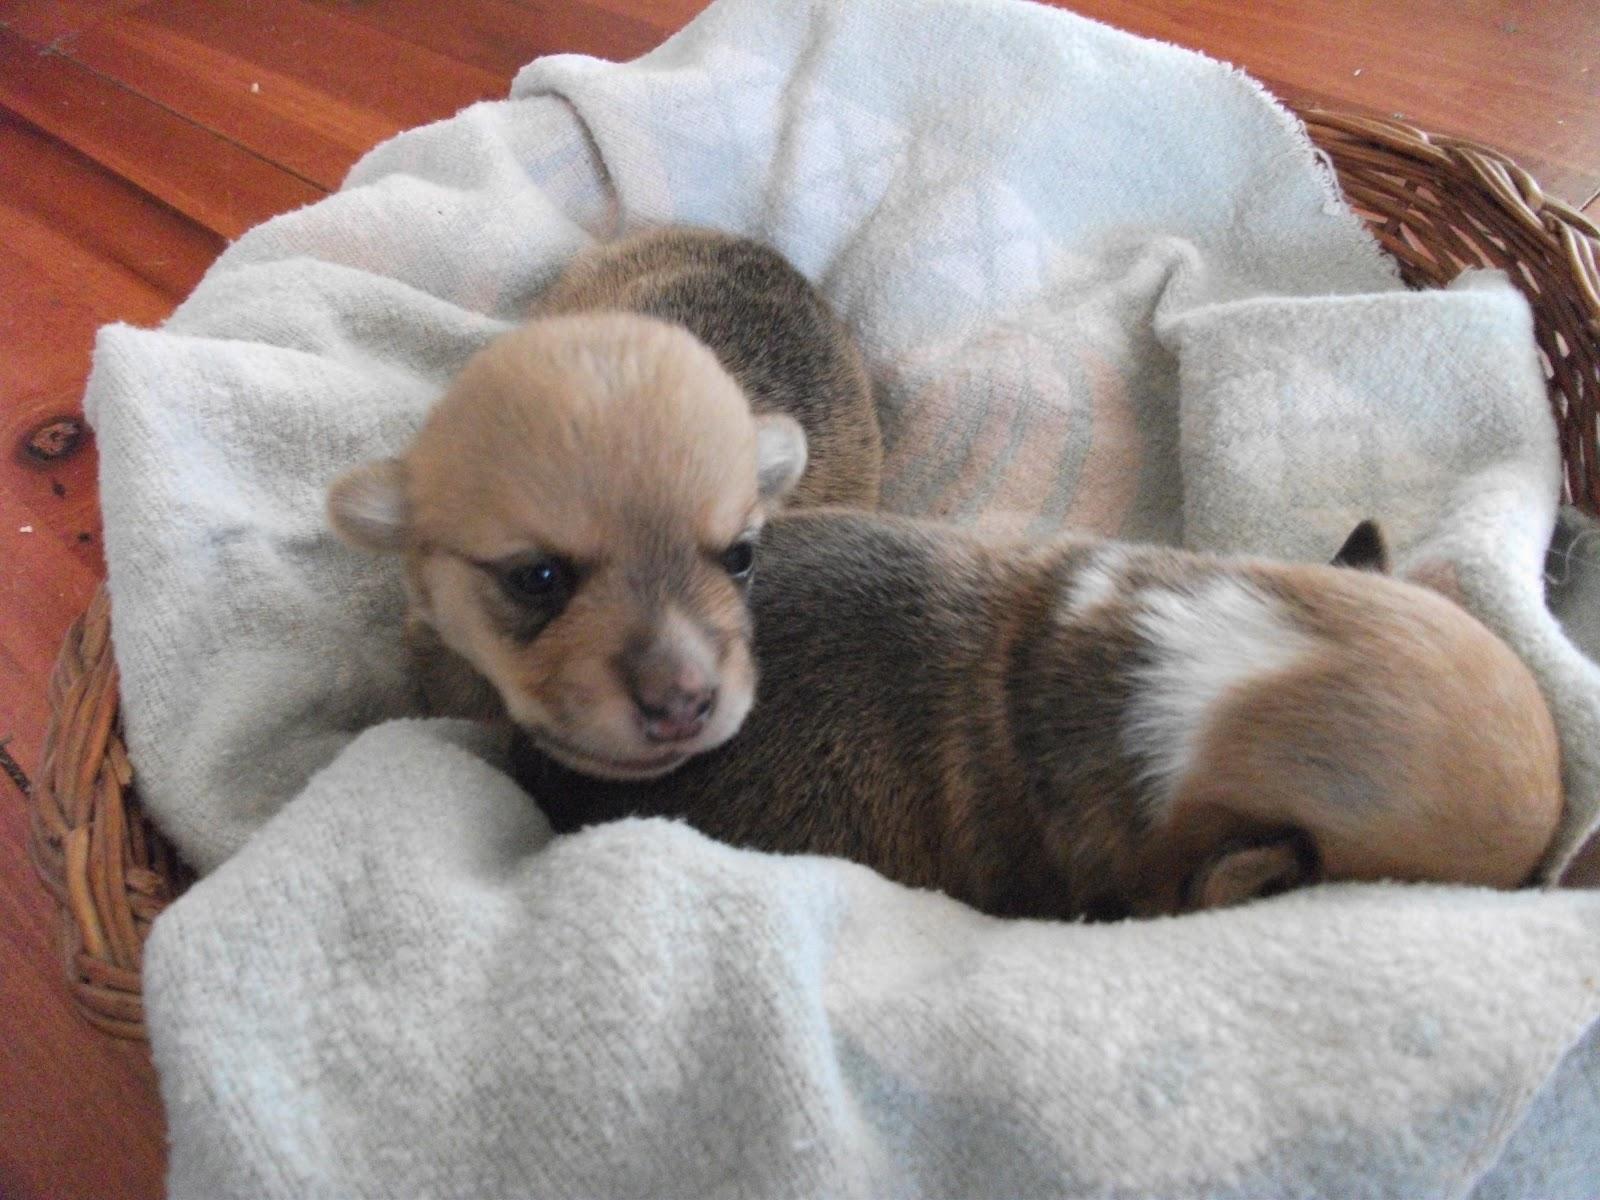 Homeschool and Homestead AKC Pembroke Welsh Corgi puppies for